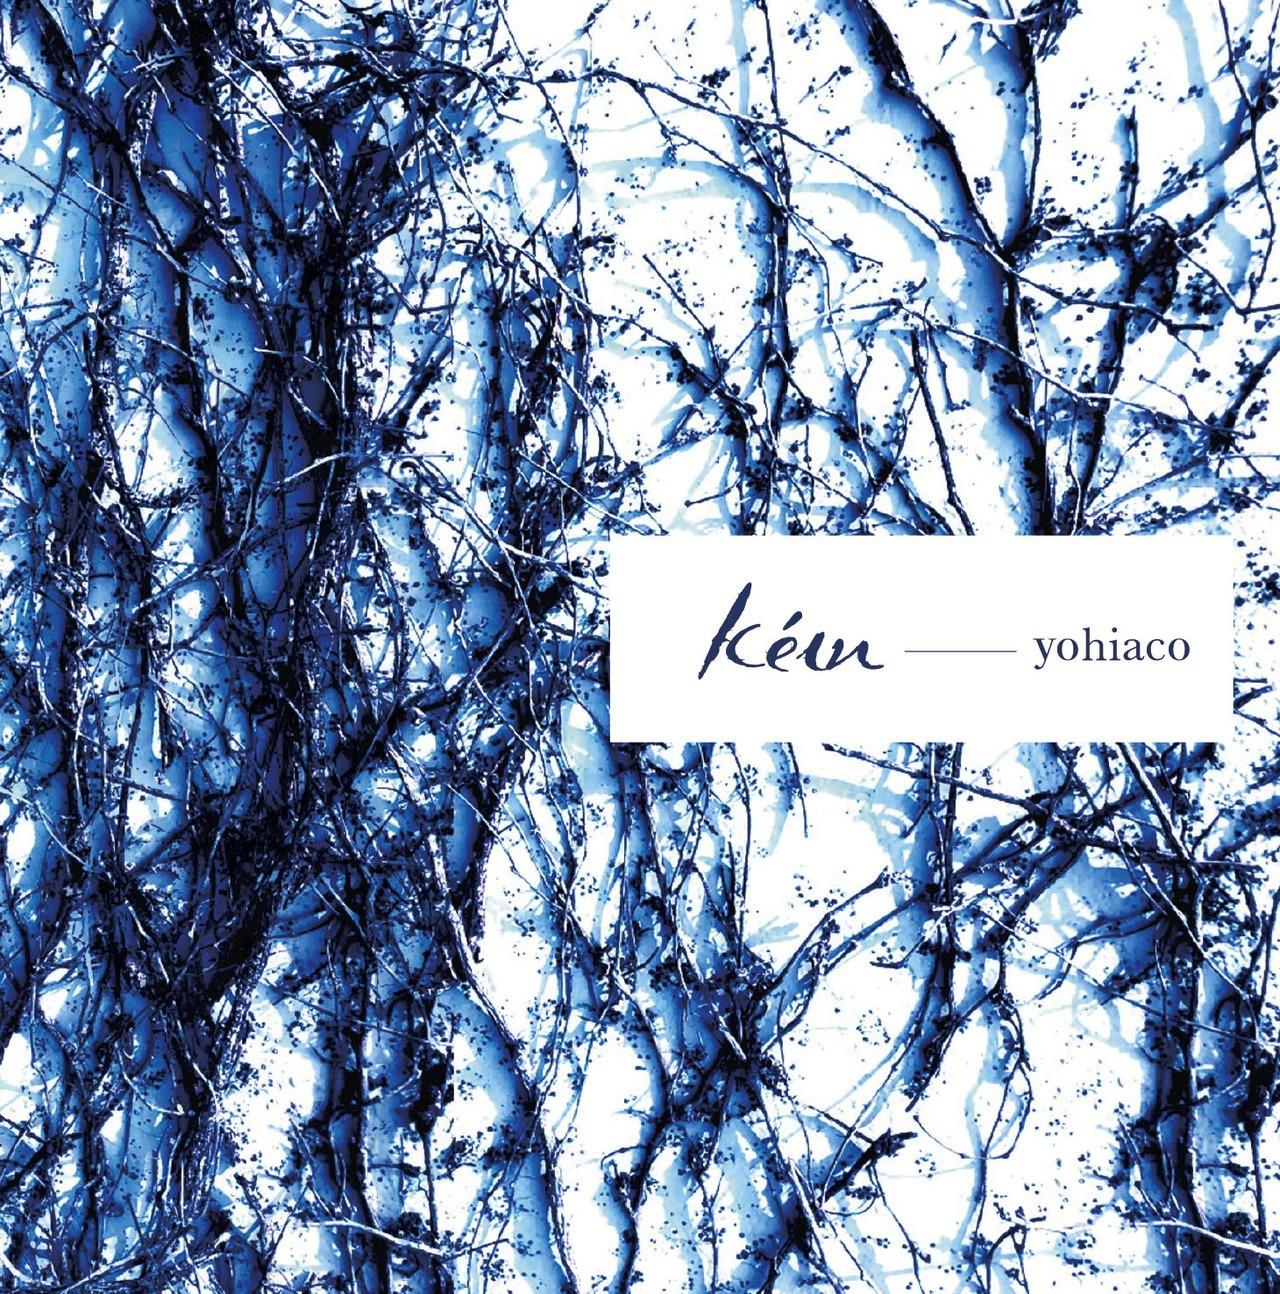 Yohiaco 2nd Album「kéɪn」リリース!!のイメージ